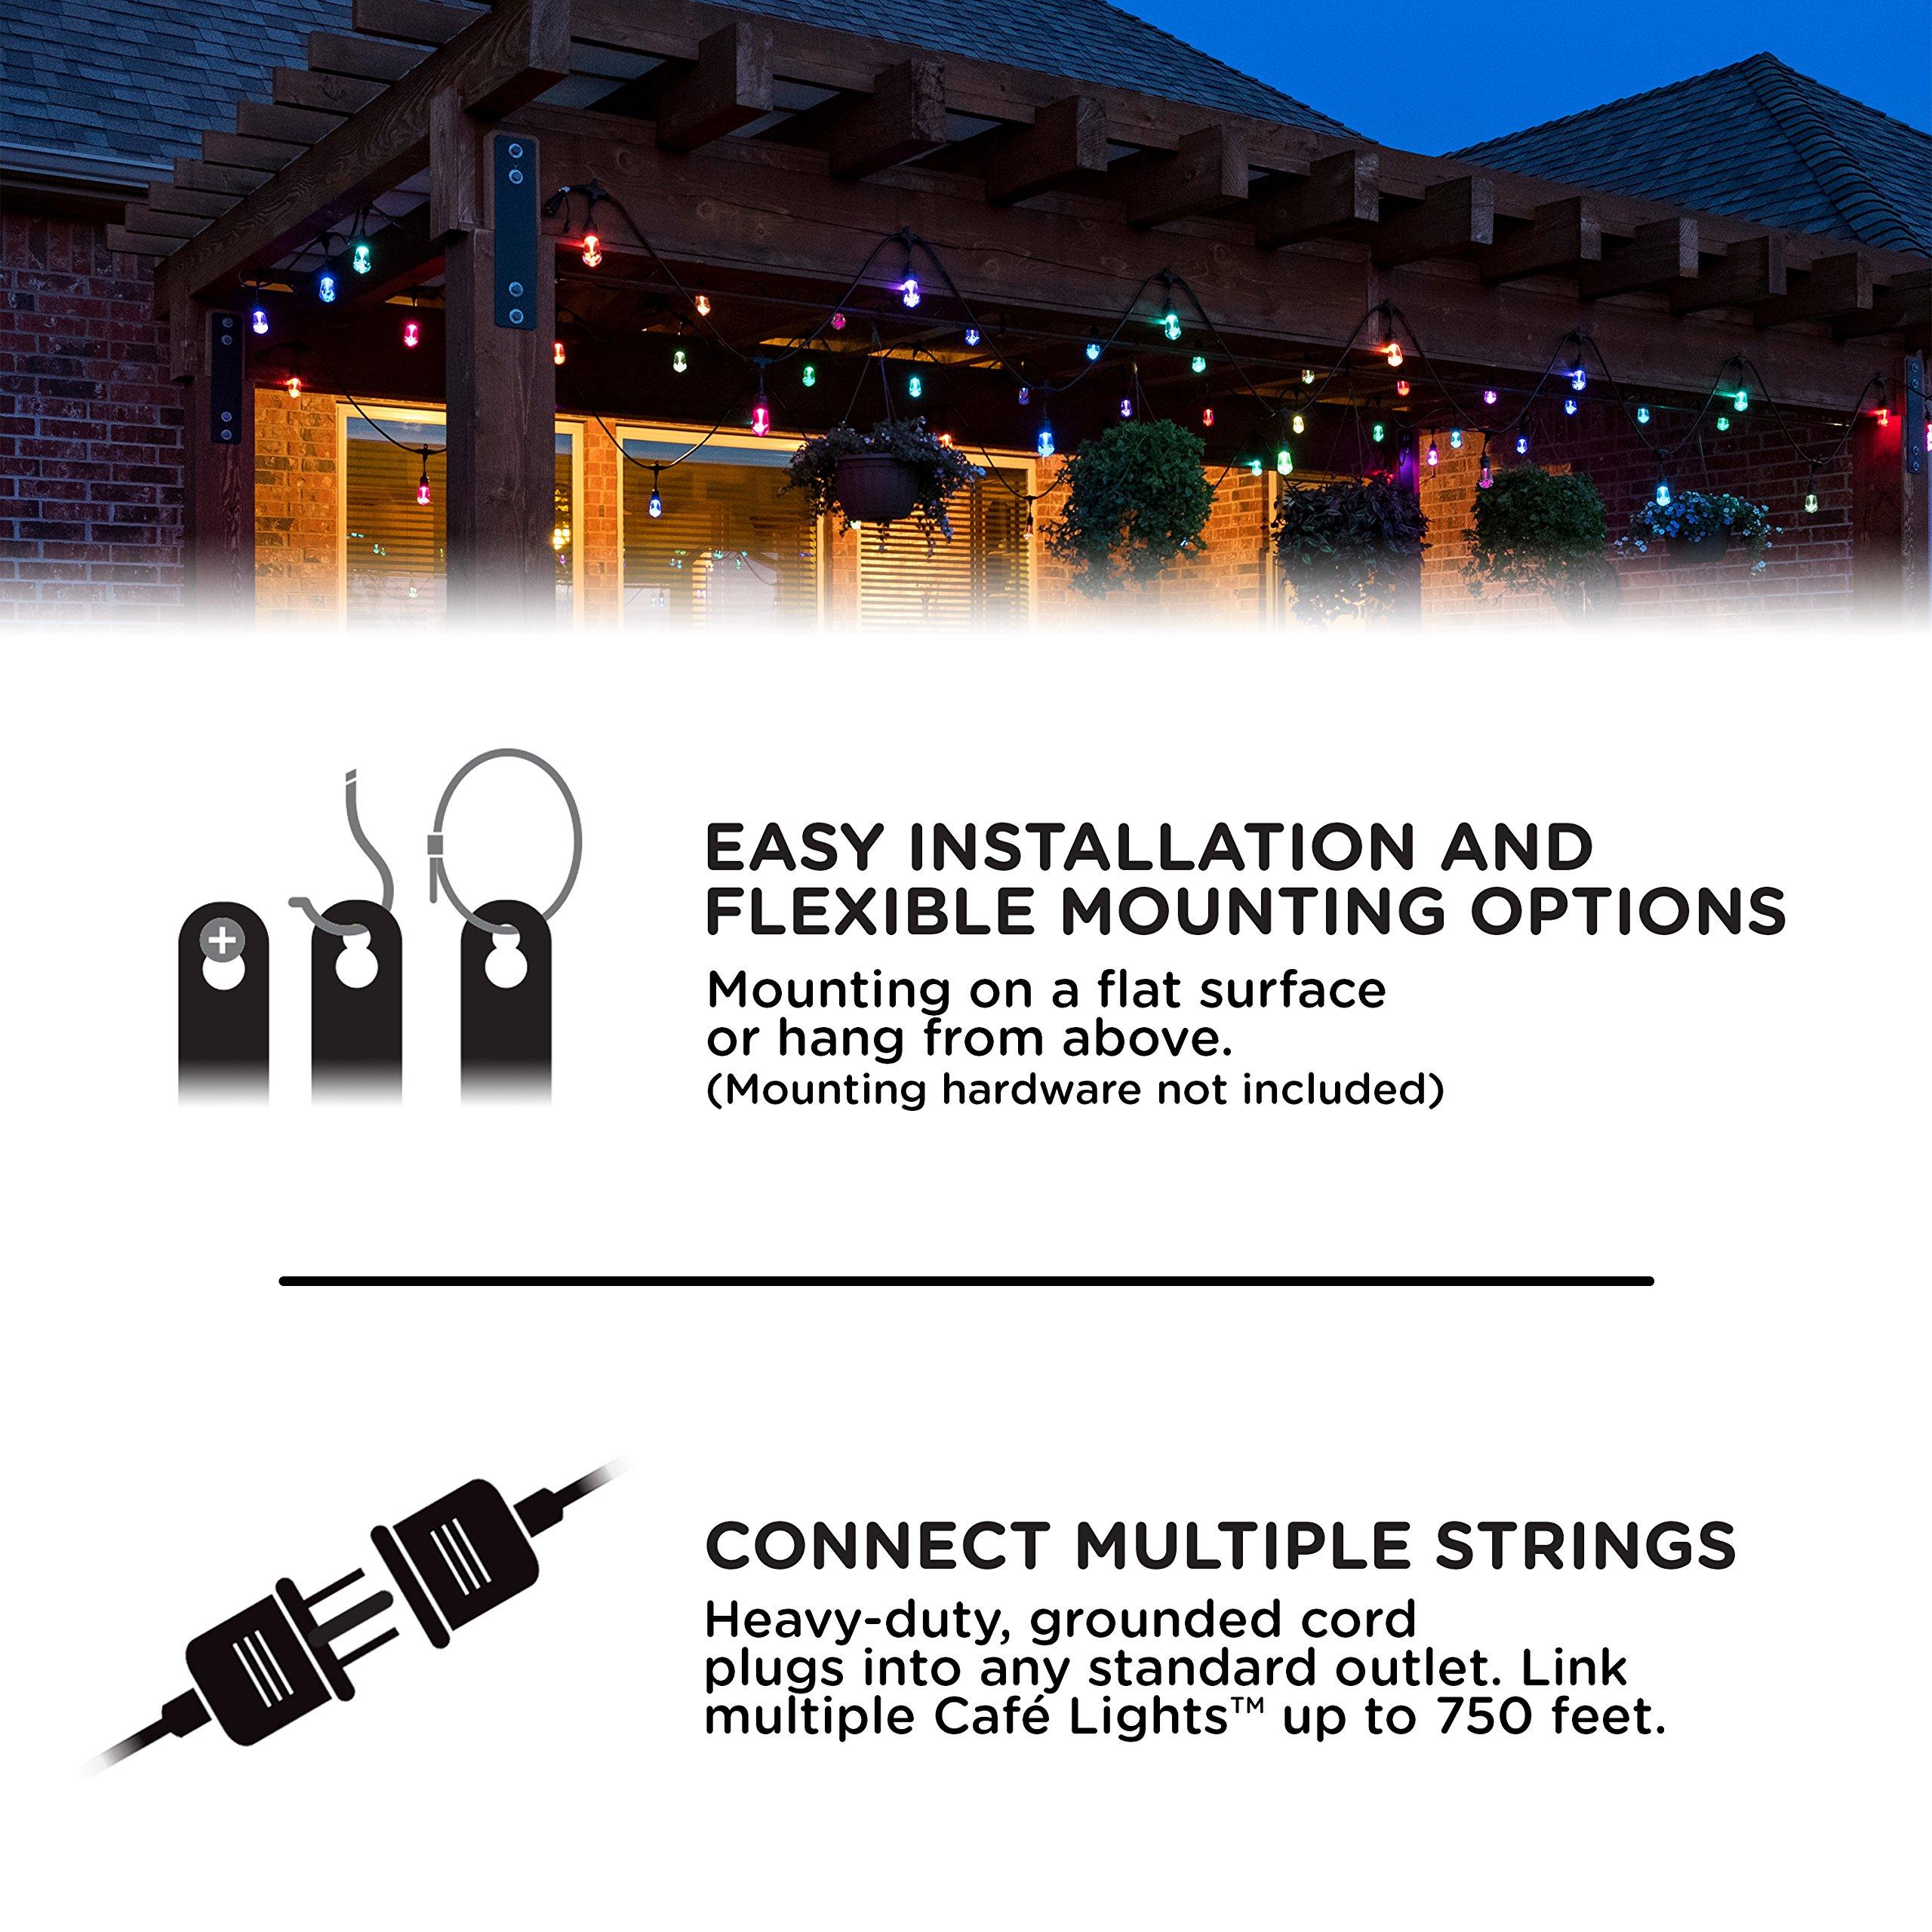 Enbrighten 37790 Vintage Seasons LED Warm White & Color Changing Café String Lights, Black, 48ft, 24 Premium Impact Resistant Lifetime Bulbs, Wireless, Weatherproof, Indoor/Outdoor, 48 ft, by Enbrighten (Image #8)